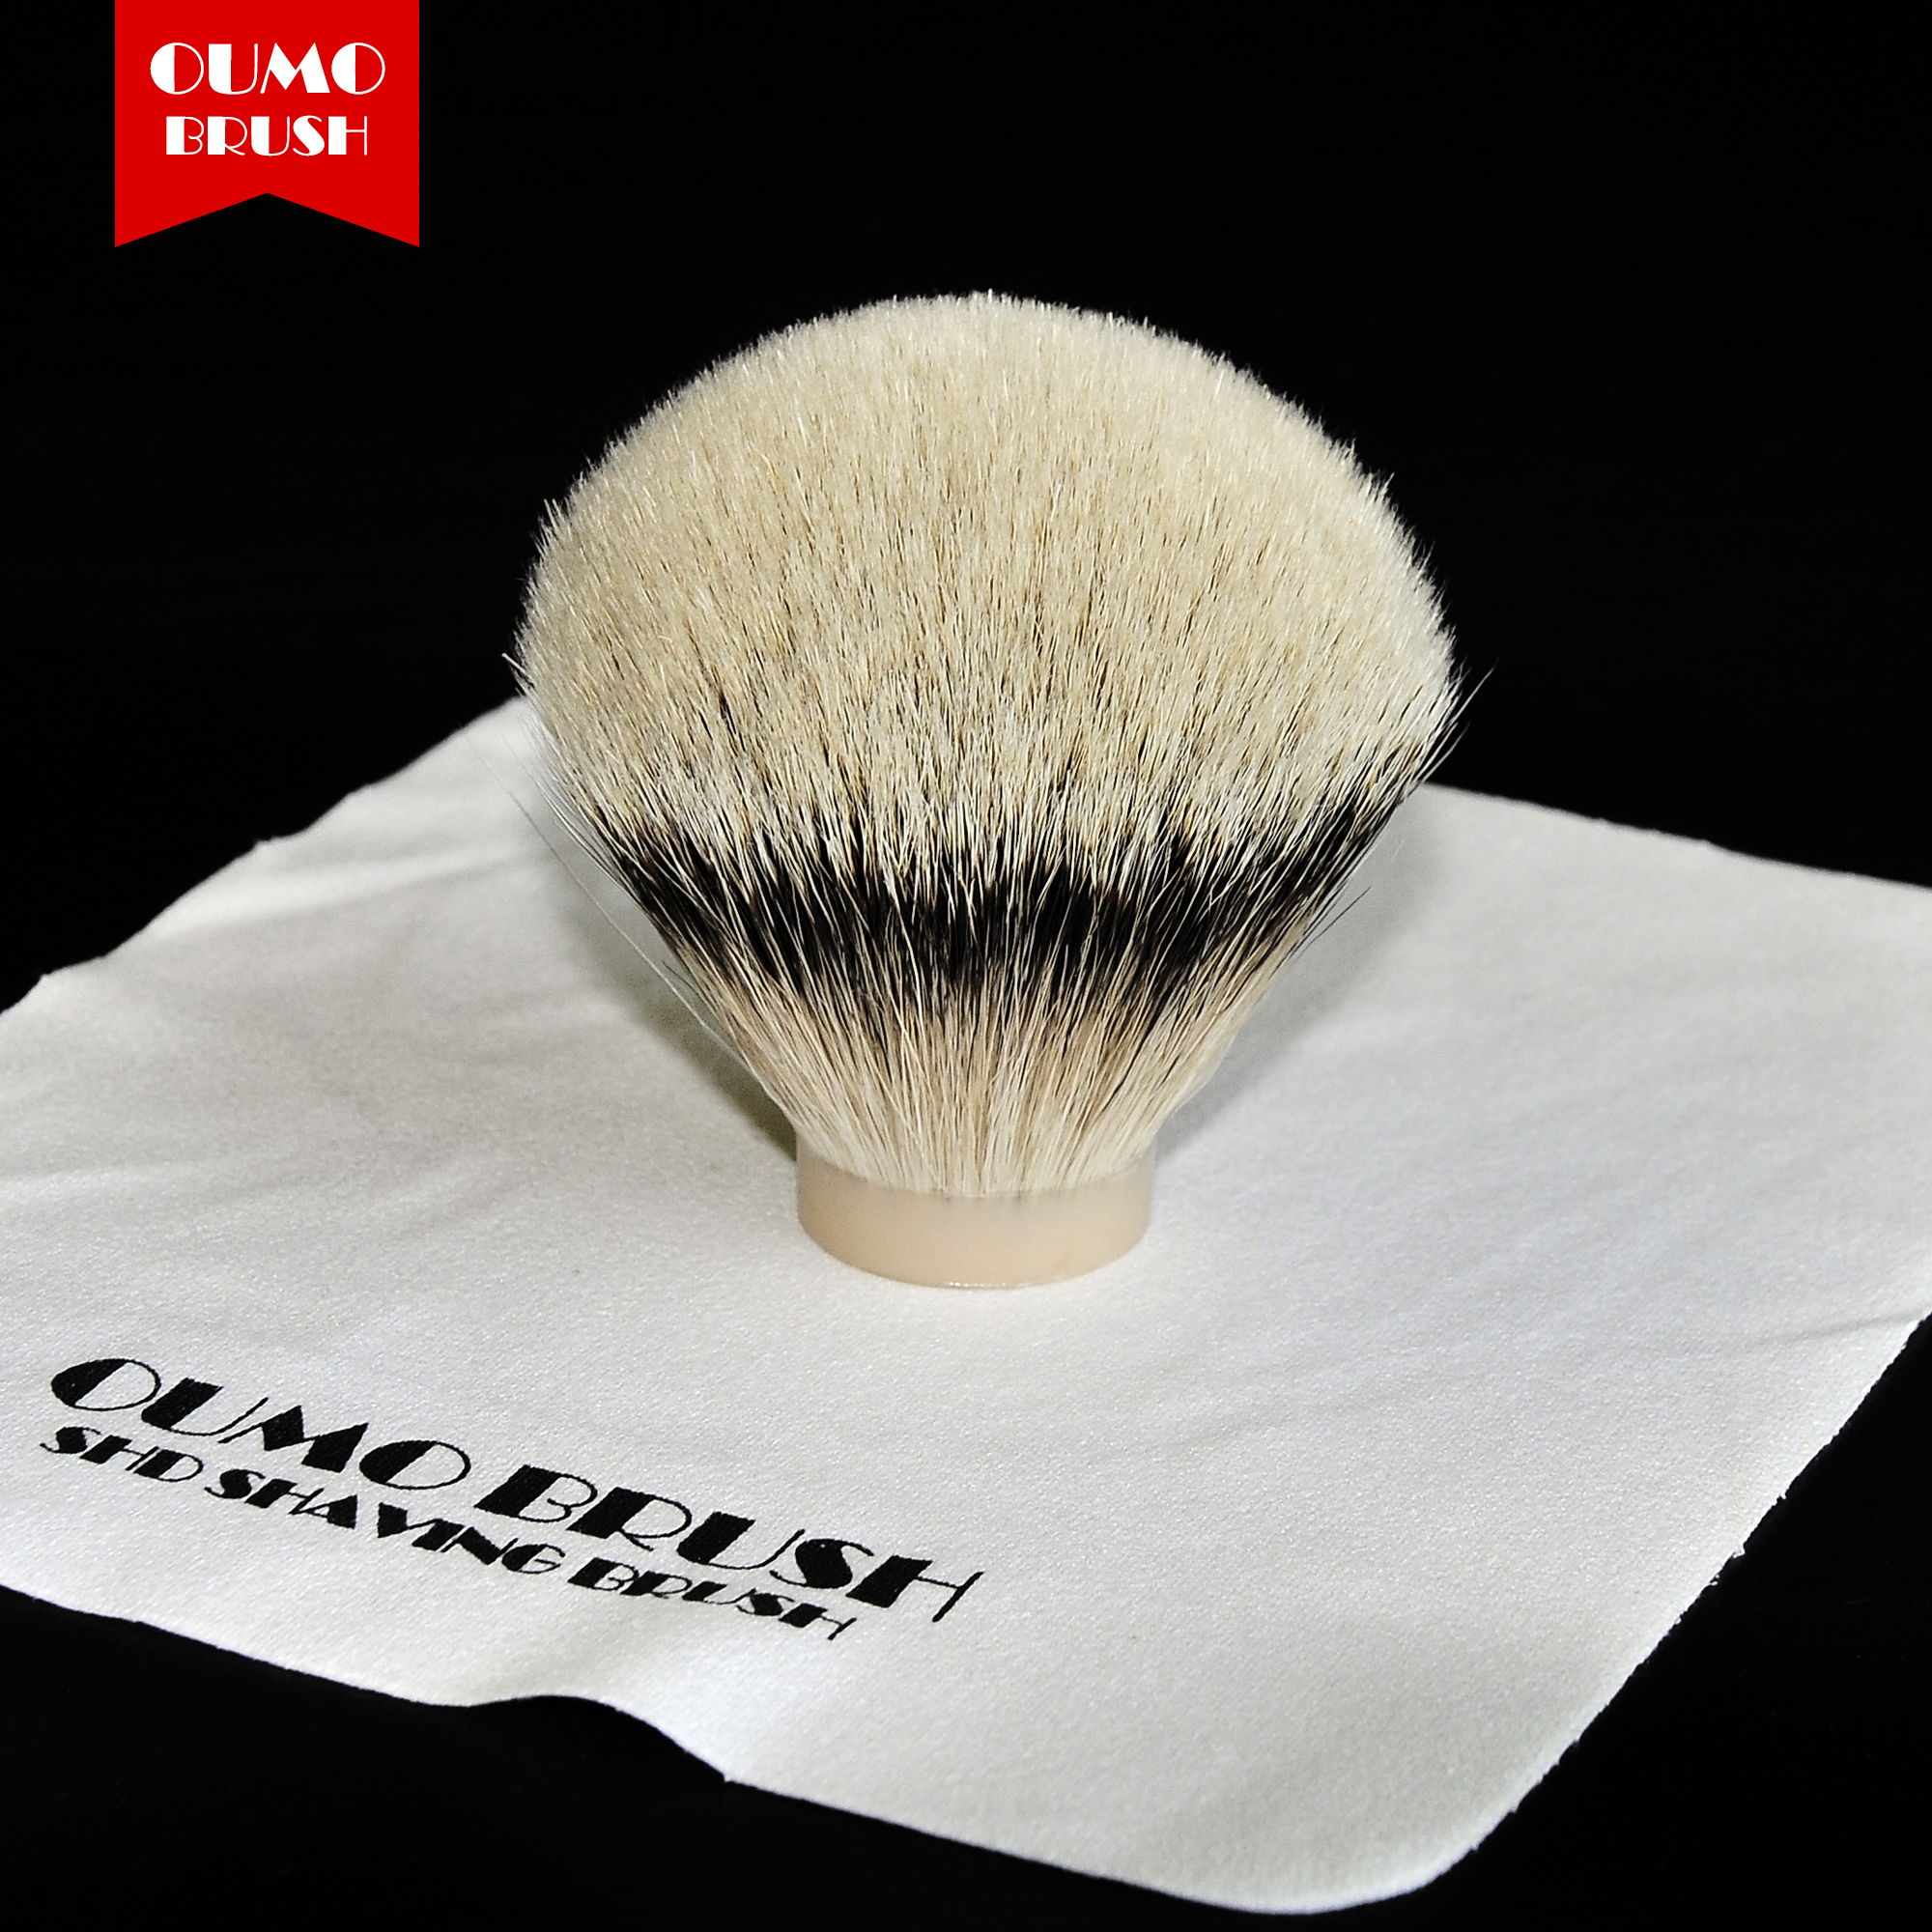 OUMOBRUSH-SHD SILK HMW Slivertip Shaving Brush Knots Gel Tip